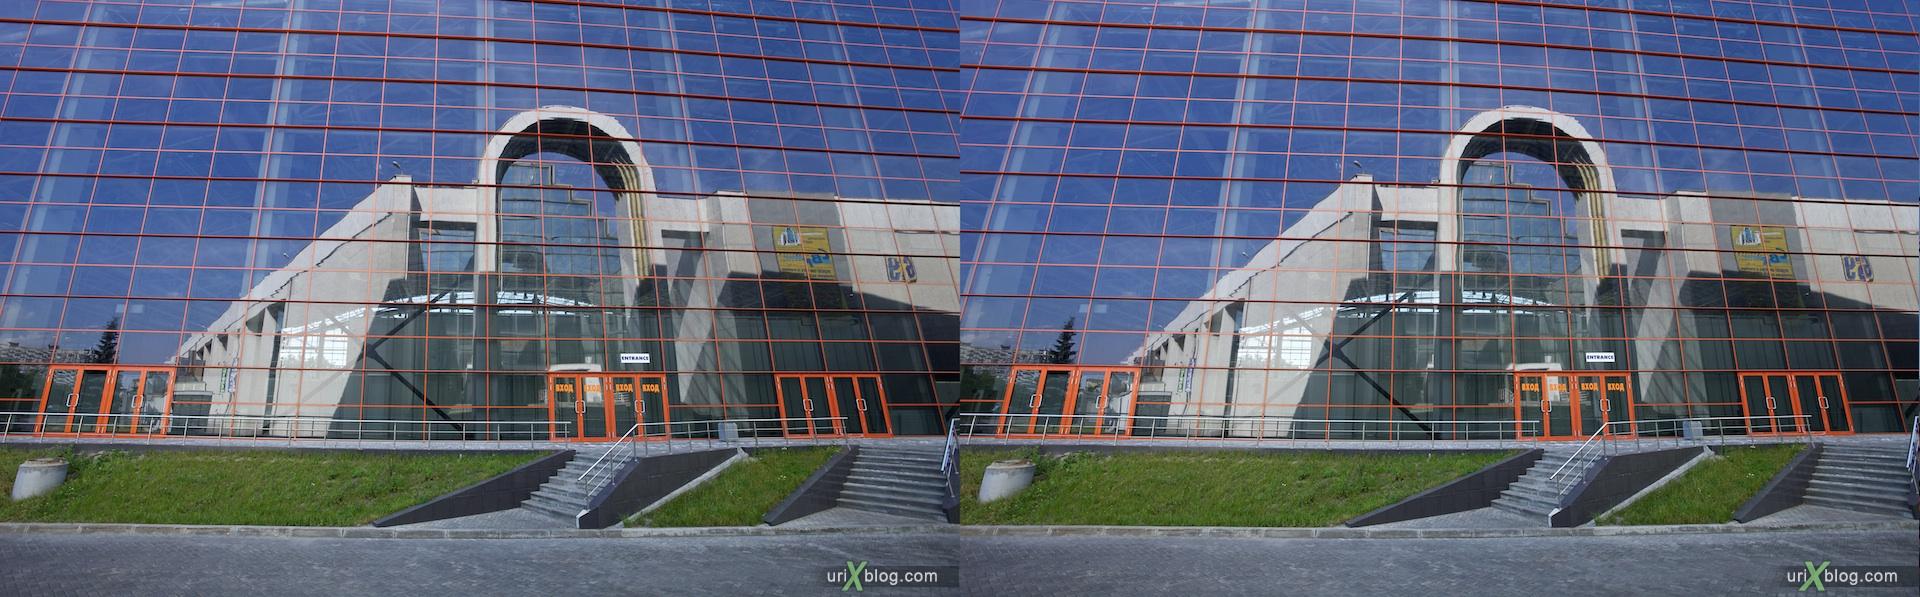 2010 3D, stereo, cross-eyed, стерео, стереопара ВВЦ, Москва ВДНХ Moscow, VVTs VDNKh